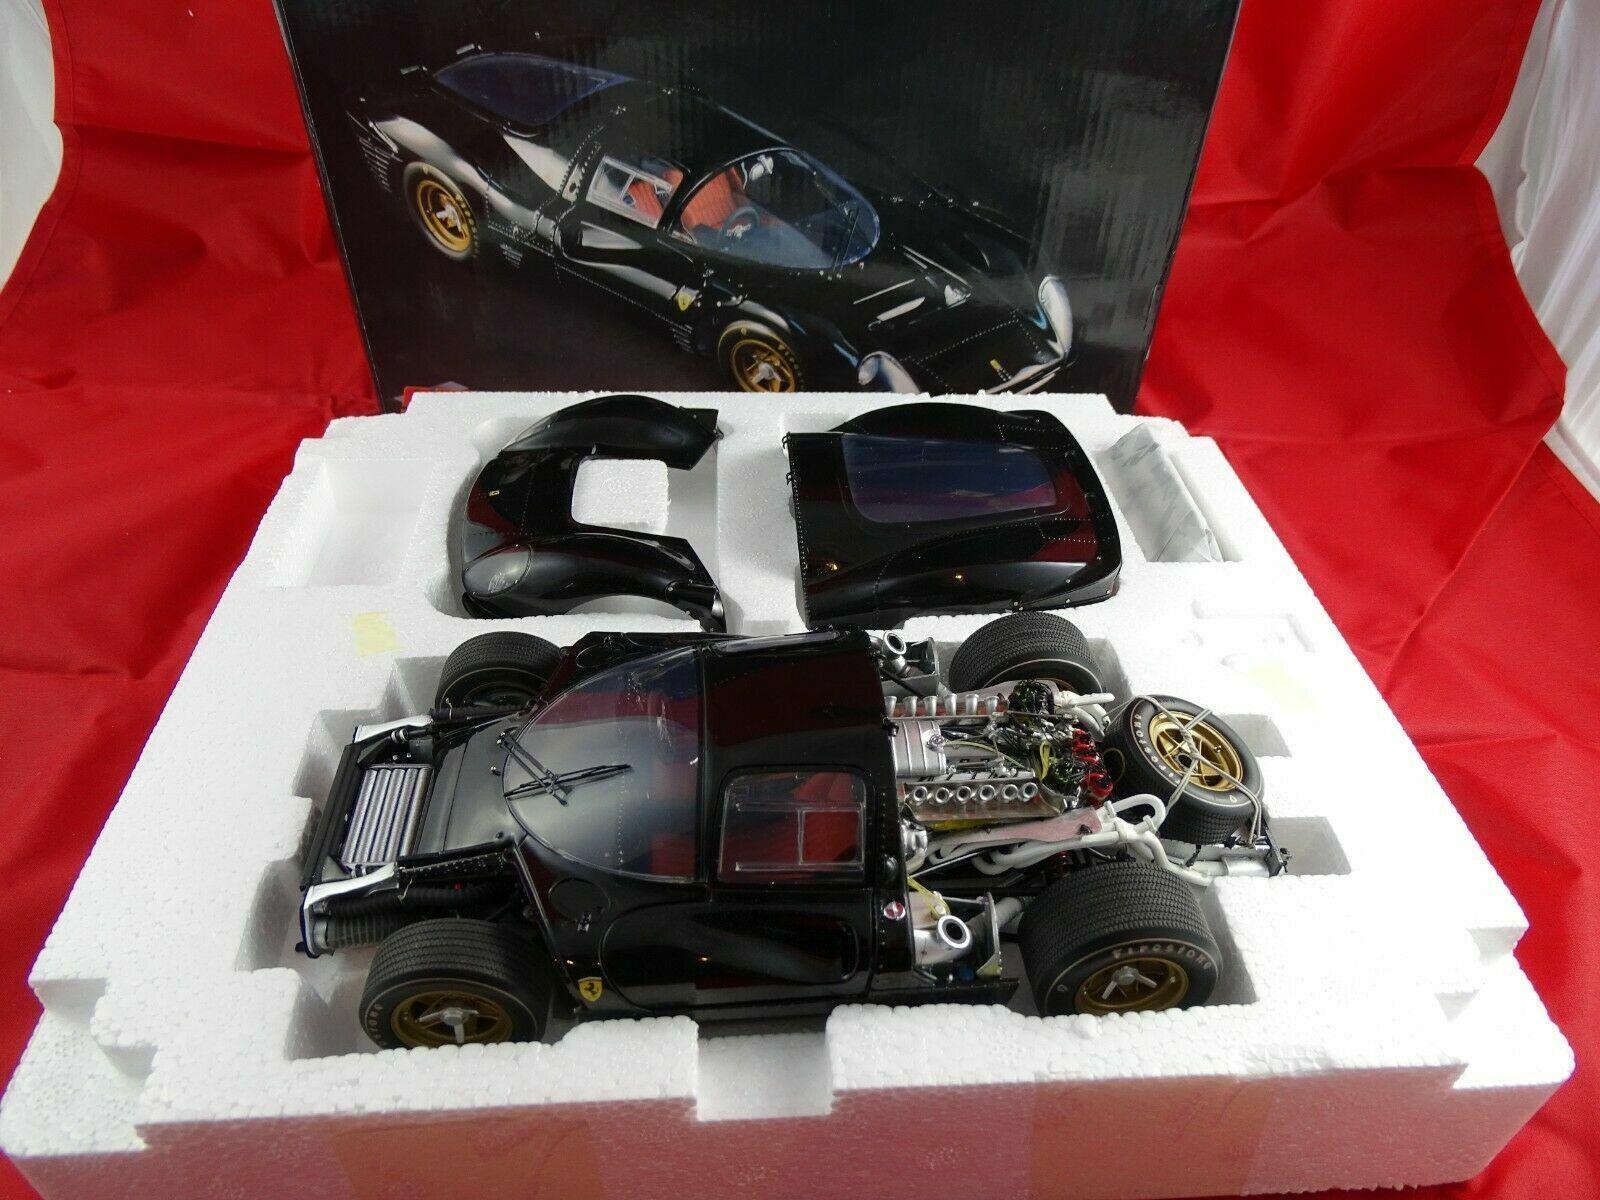 1 18 GMP ferrari 330 p4 Projootype negro Limited Edition nuevo en el embalaje original